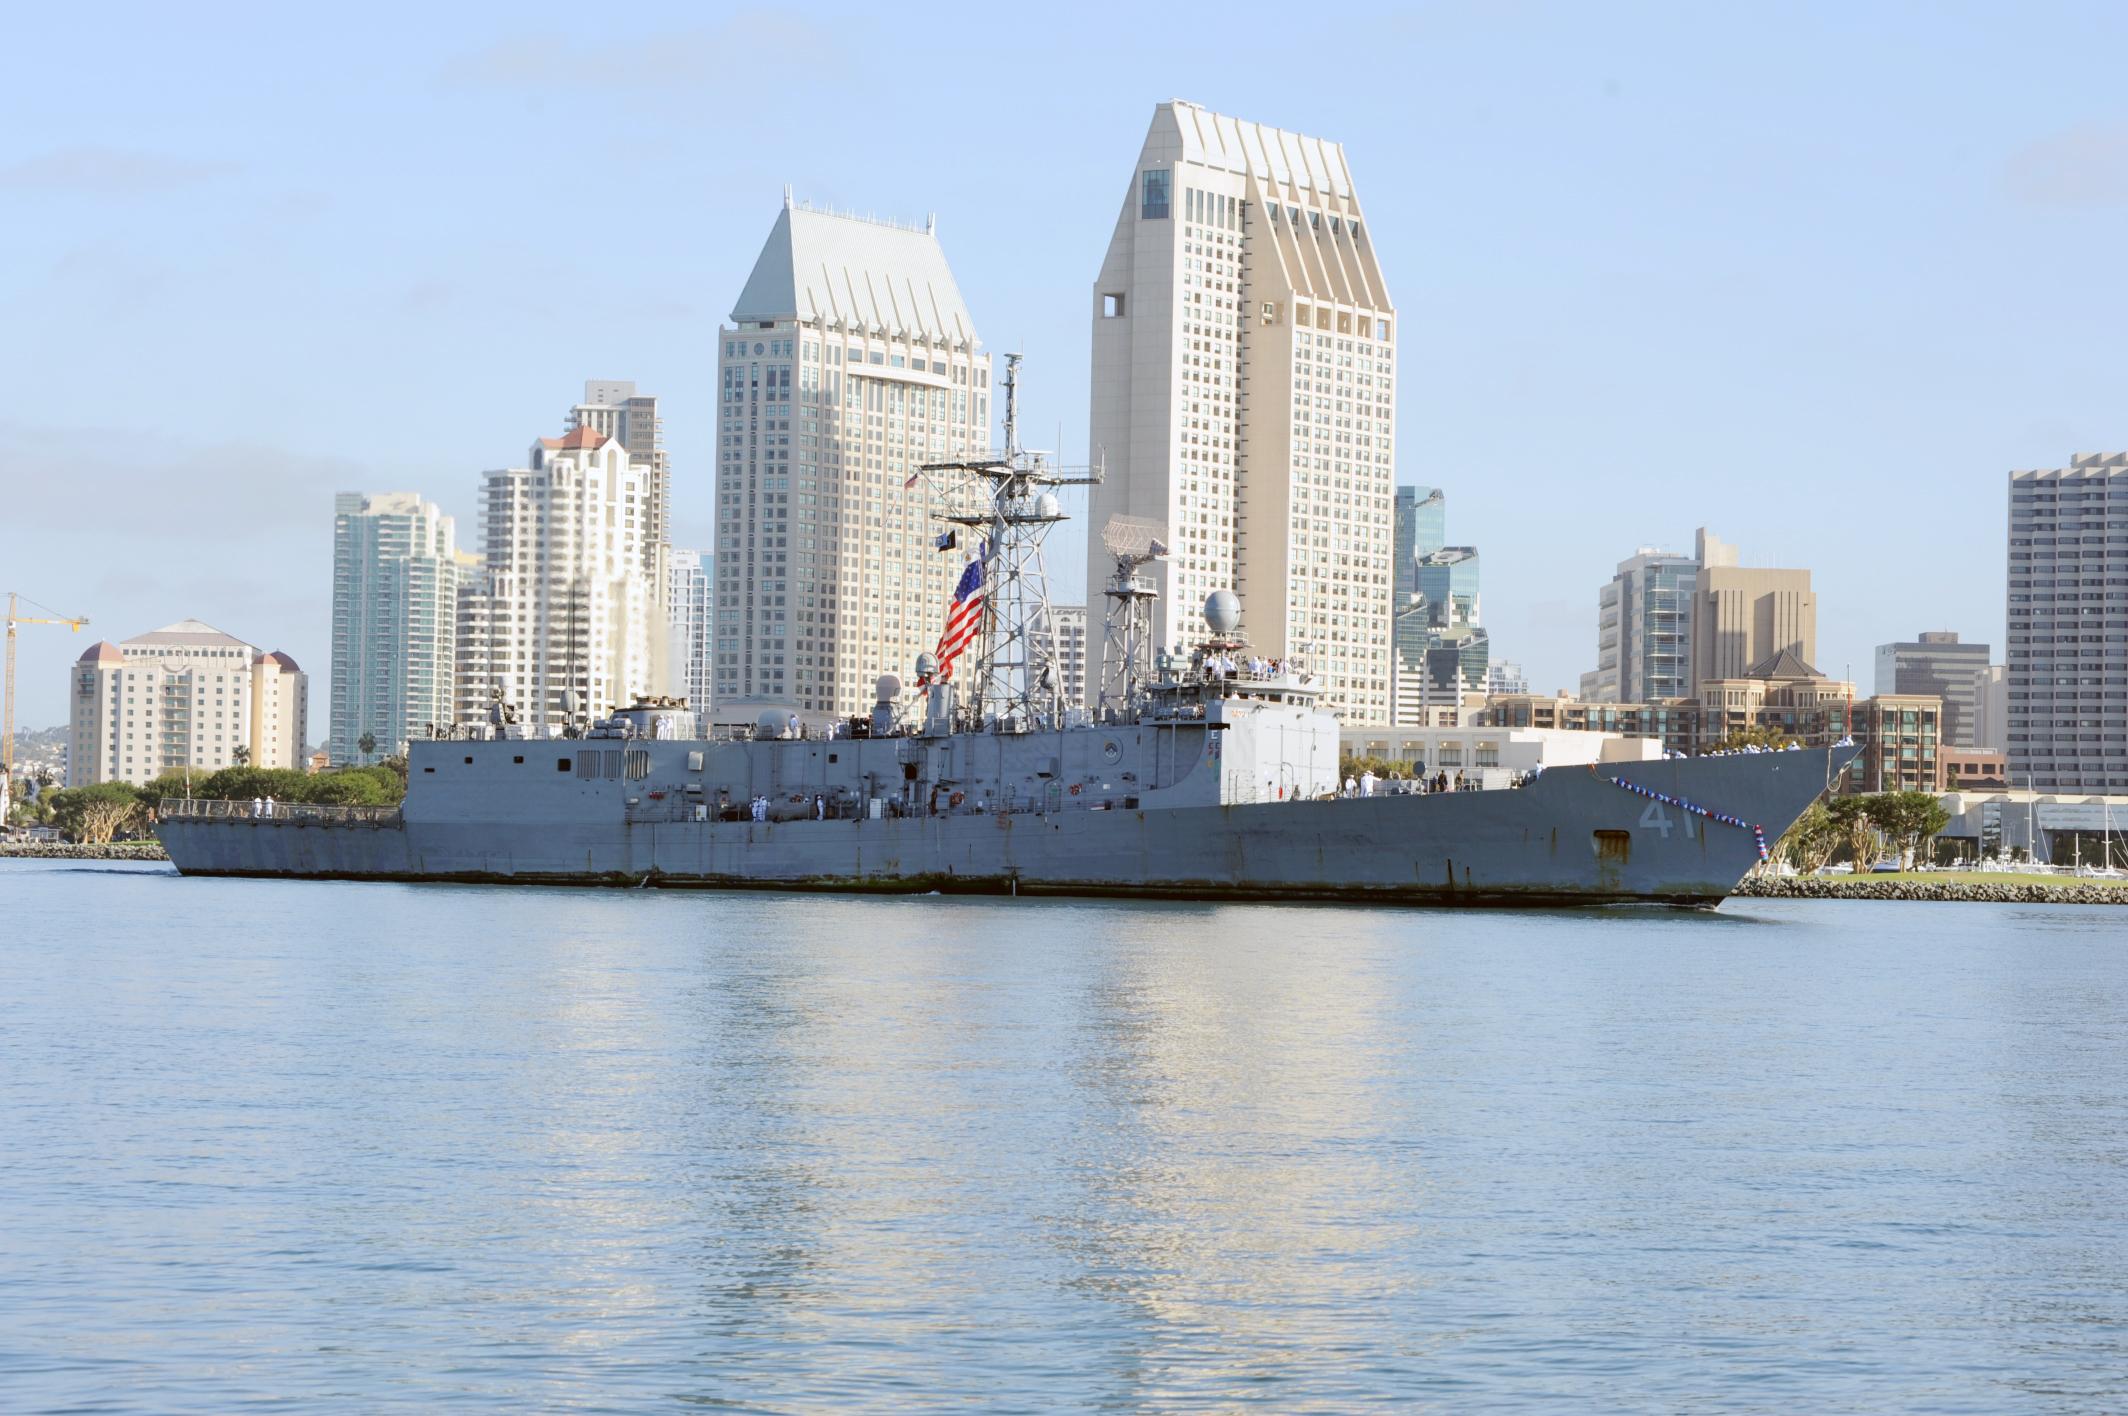 USS McCLUSKY FFG-41 Einlaufen San Diego am 26.09.2014 Bild: U.S. Navy